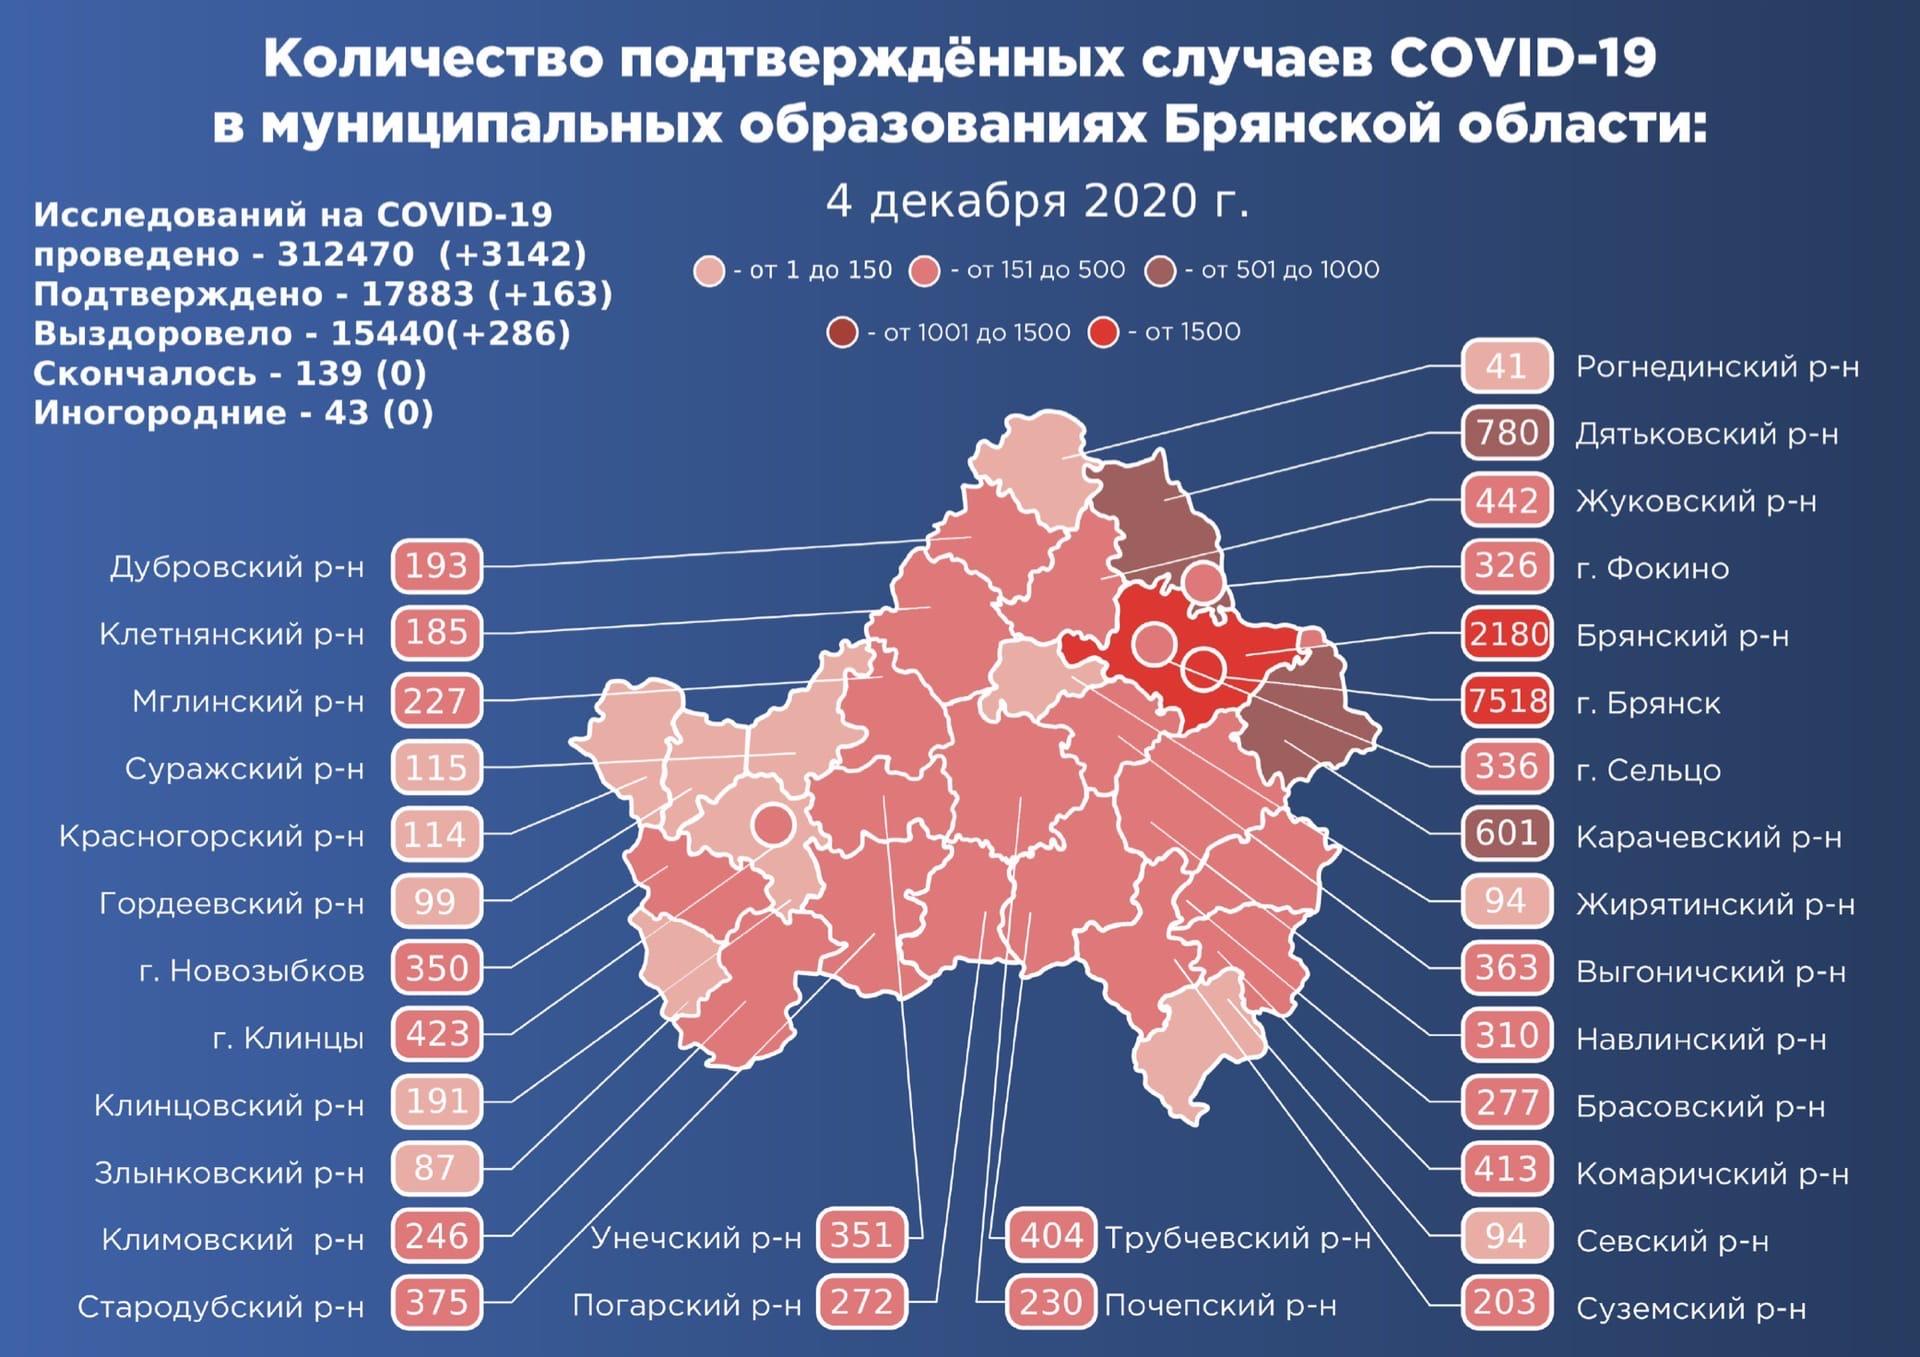 Коронавирус в Брянской области - ситуация на 4 декабря 2020